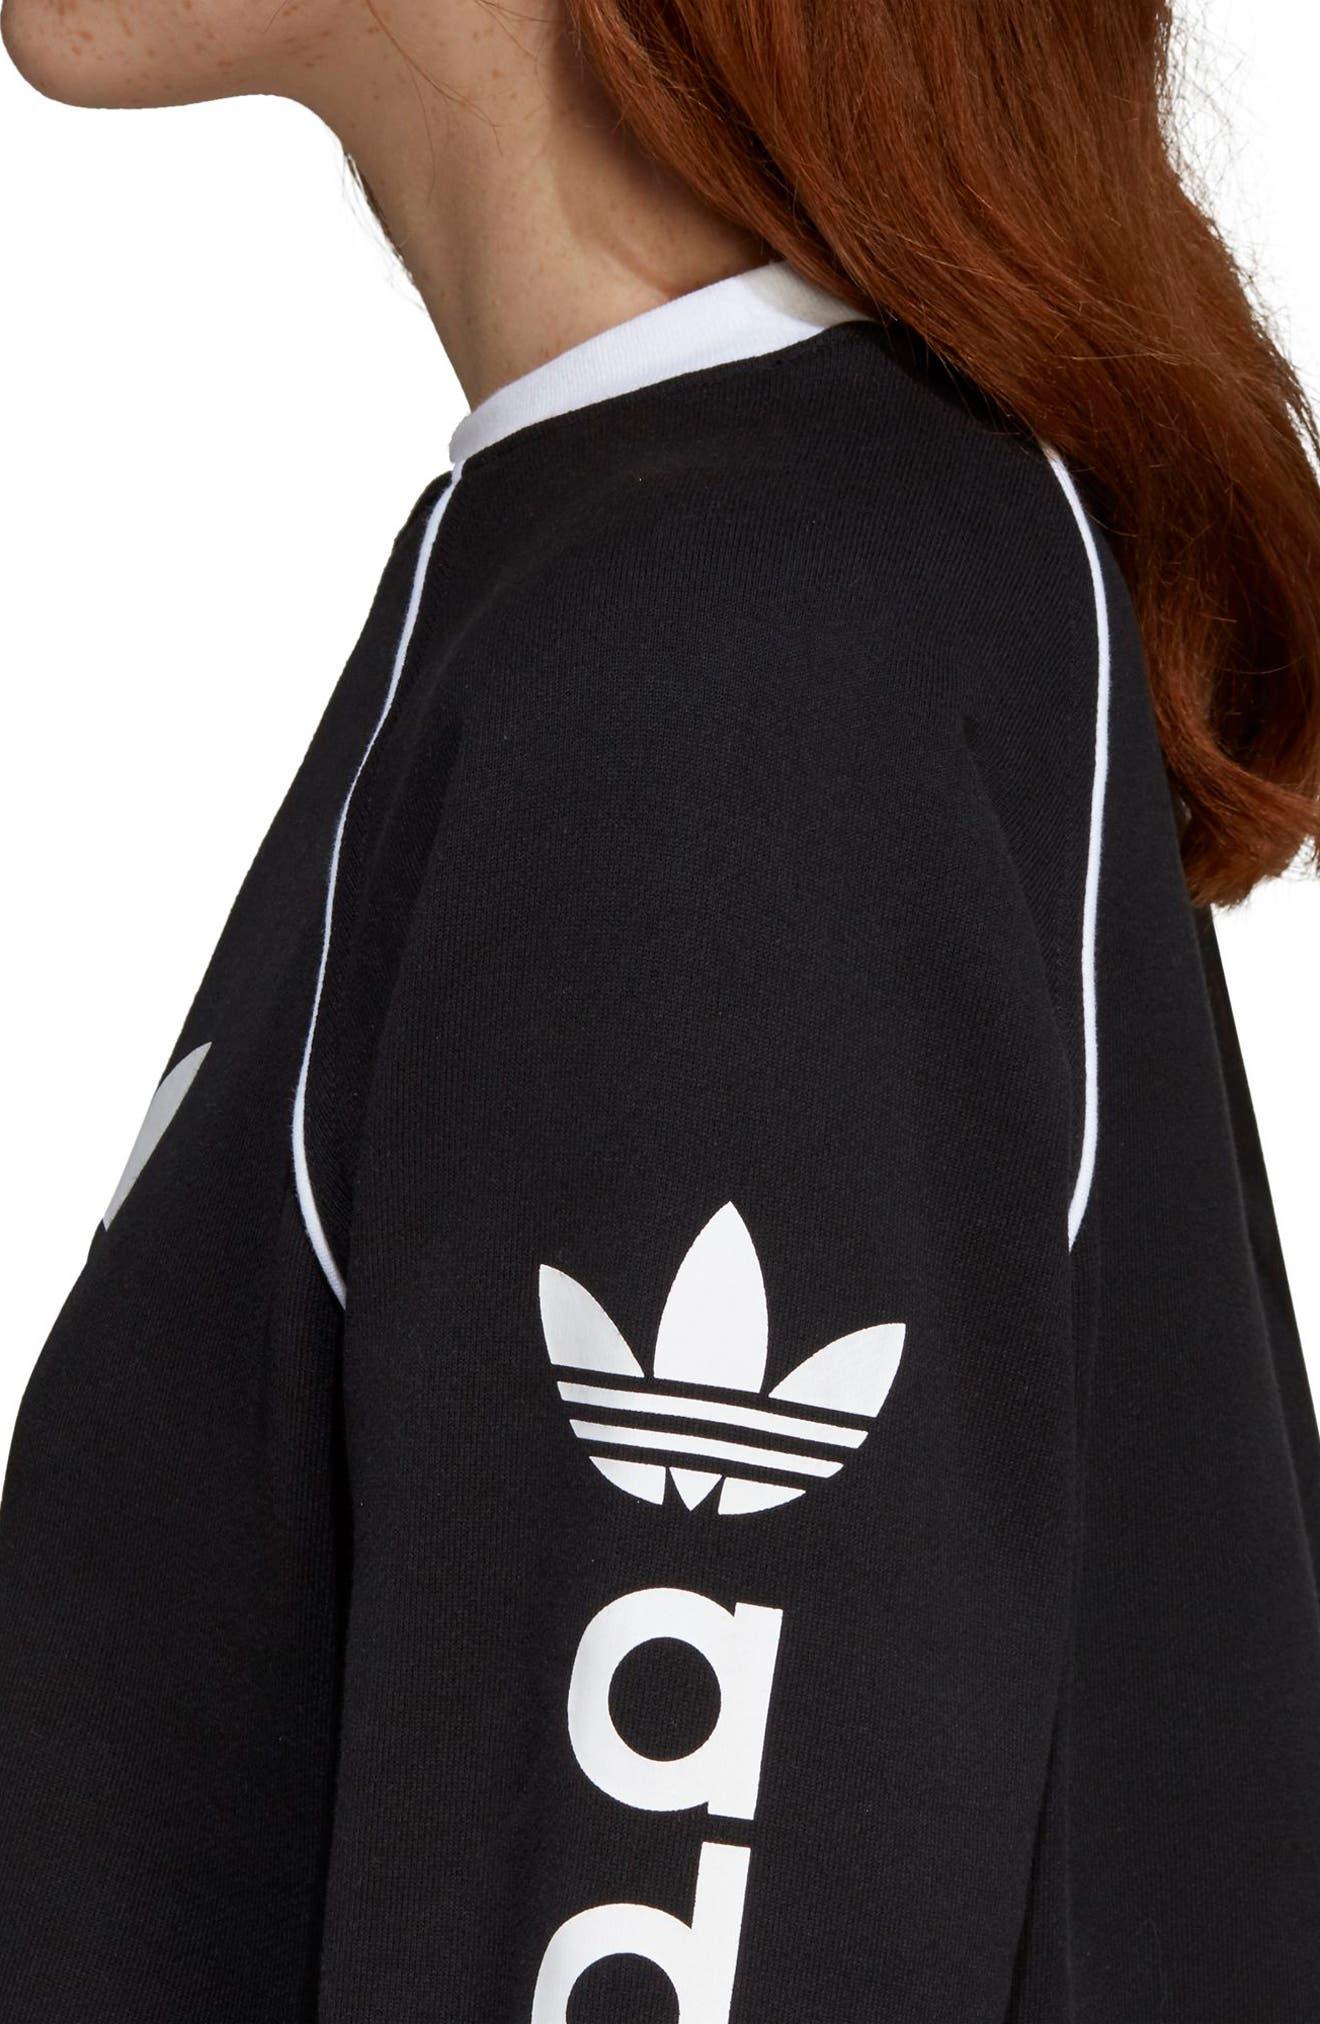 Originals Crop Sweatshirt,                             Alternate thumbnail 8, color,                             BLACK